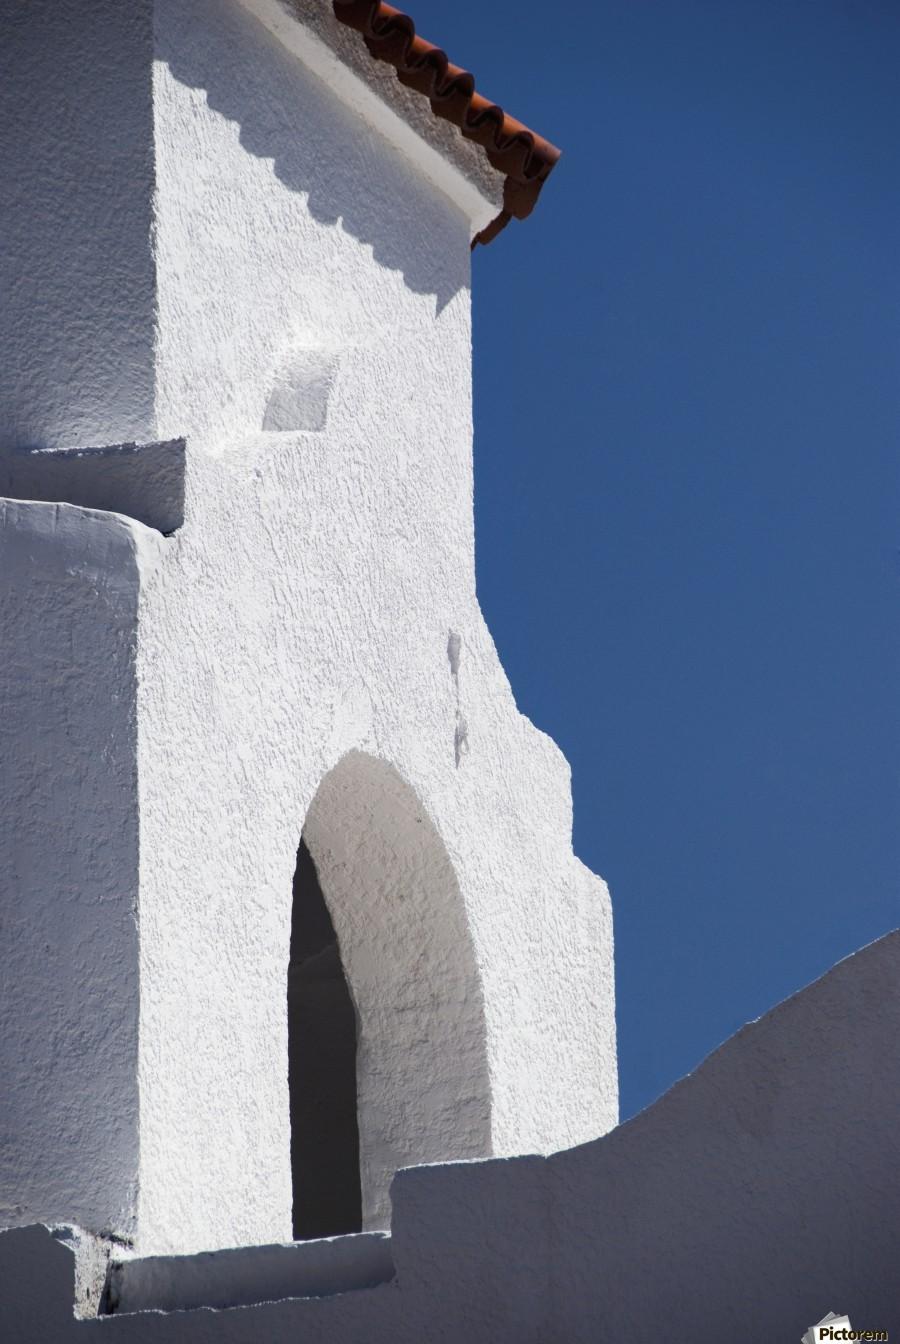 Church Bell Tower; Chacras De Coria, Mendoza, Argentina  Print